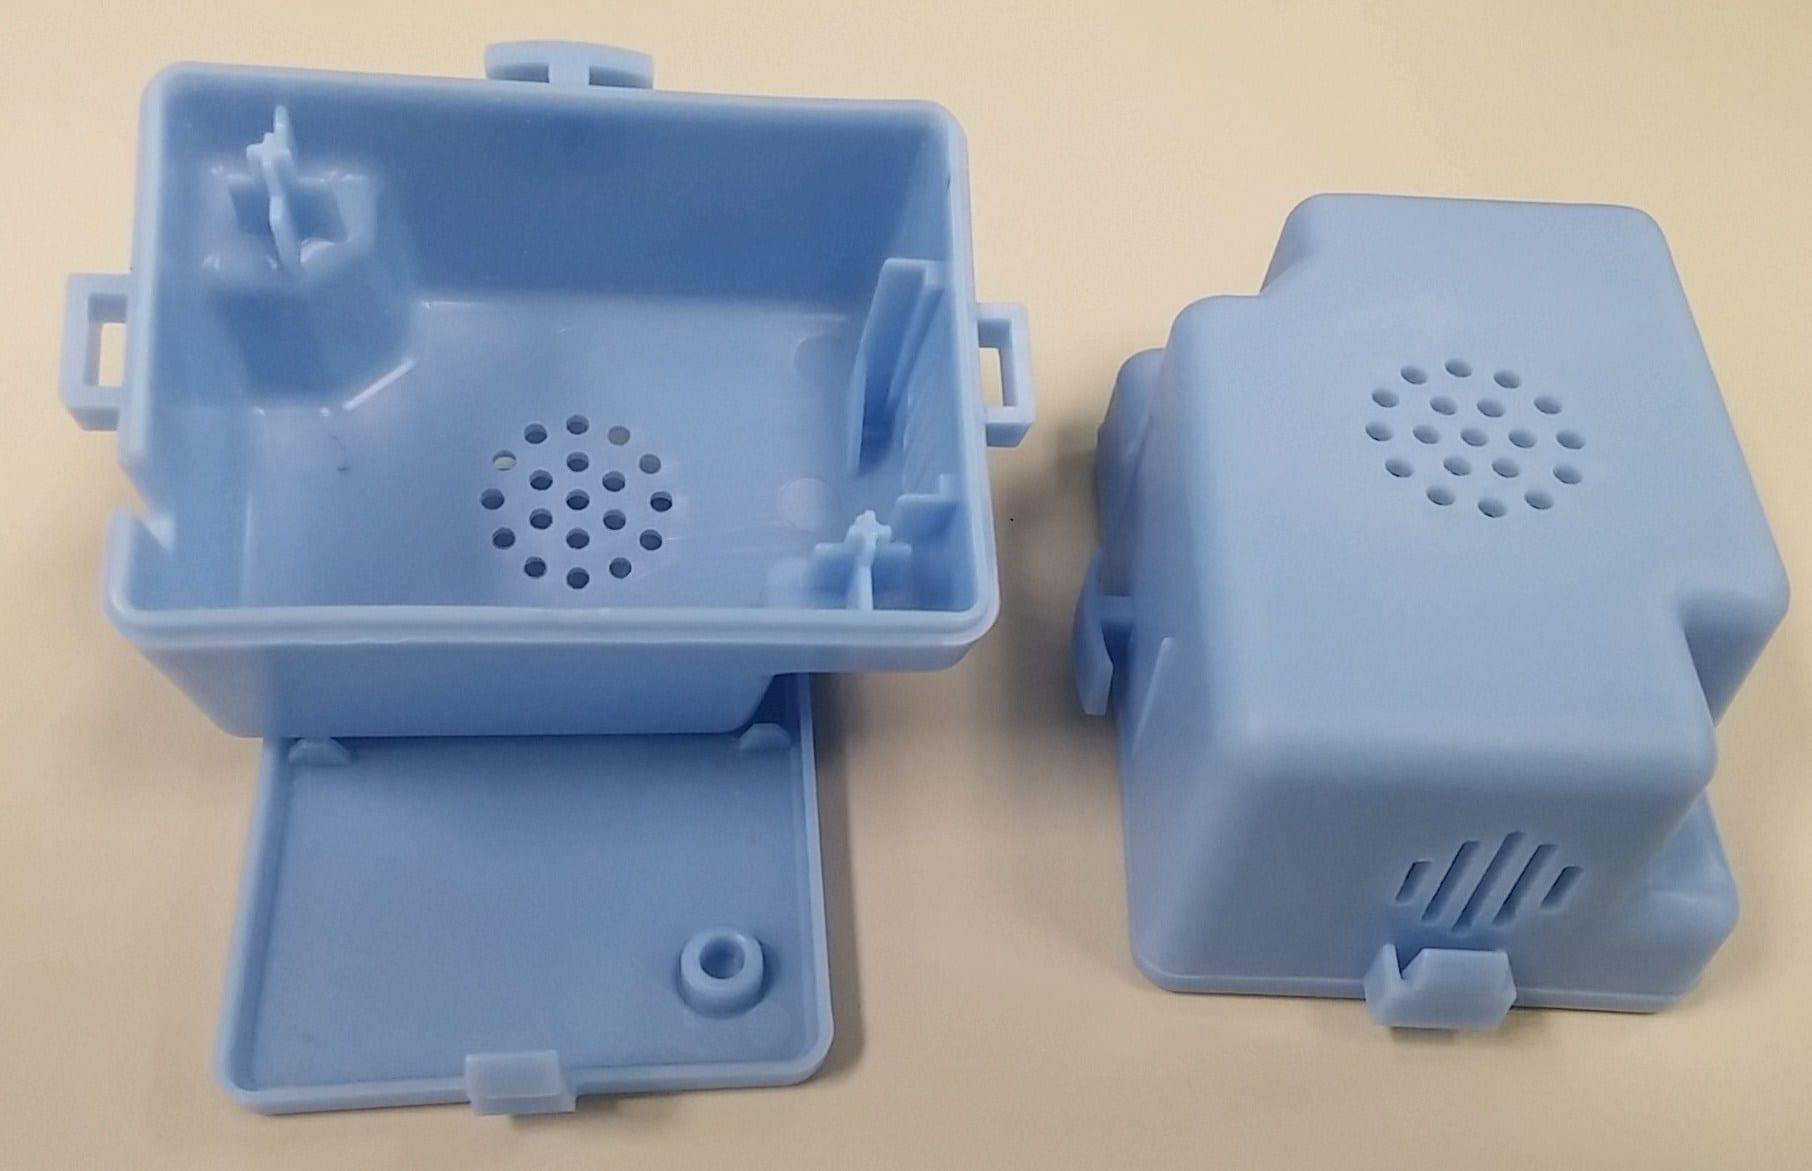 Winstronics Injection Molded Plastics